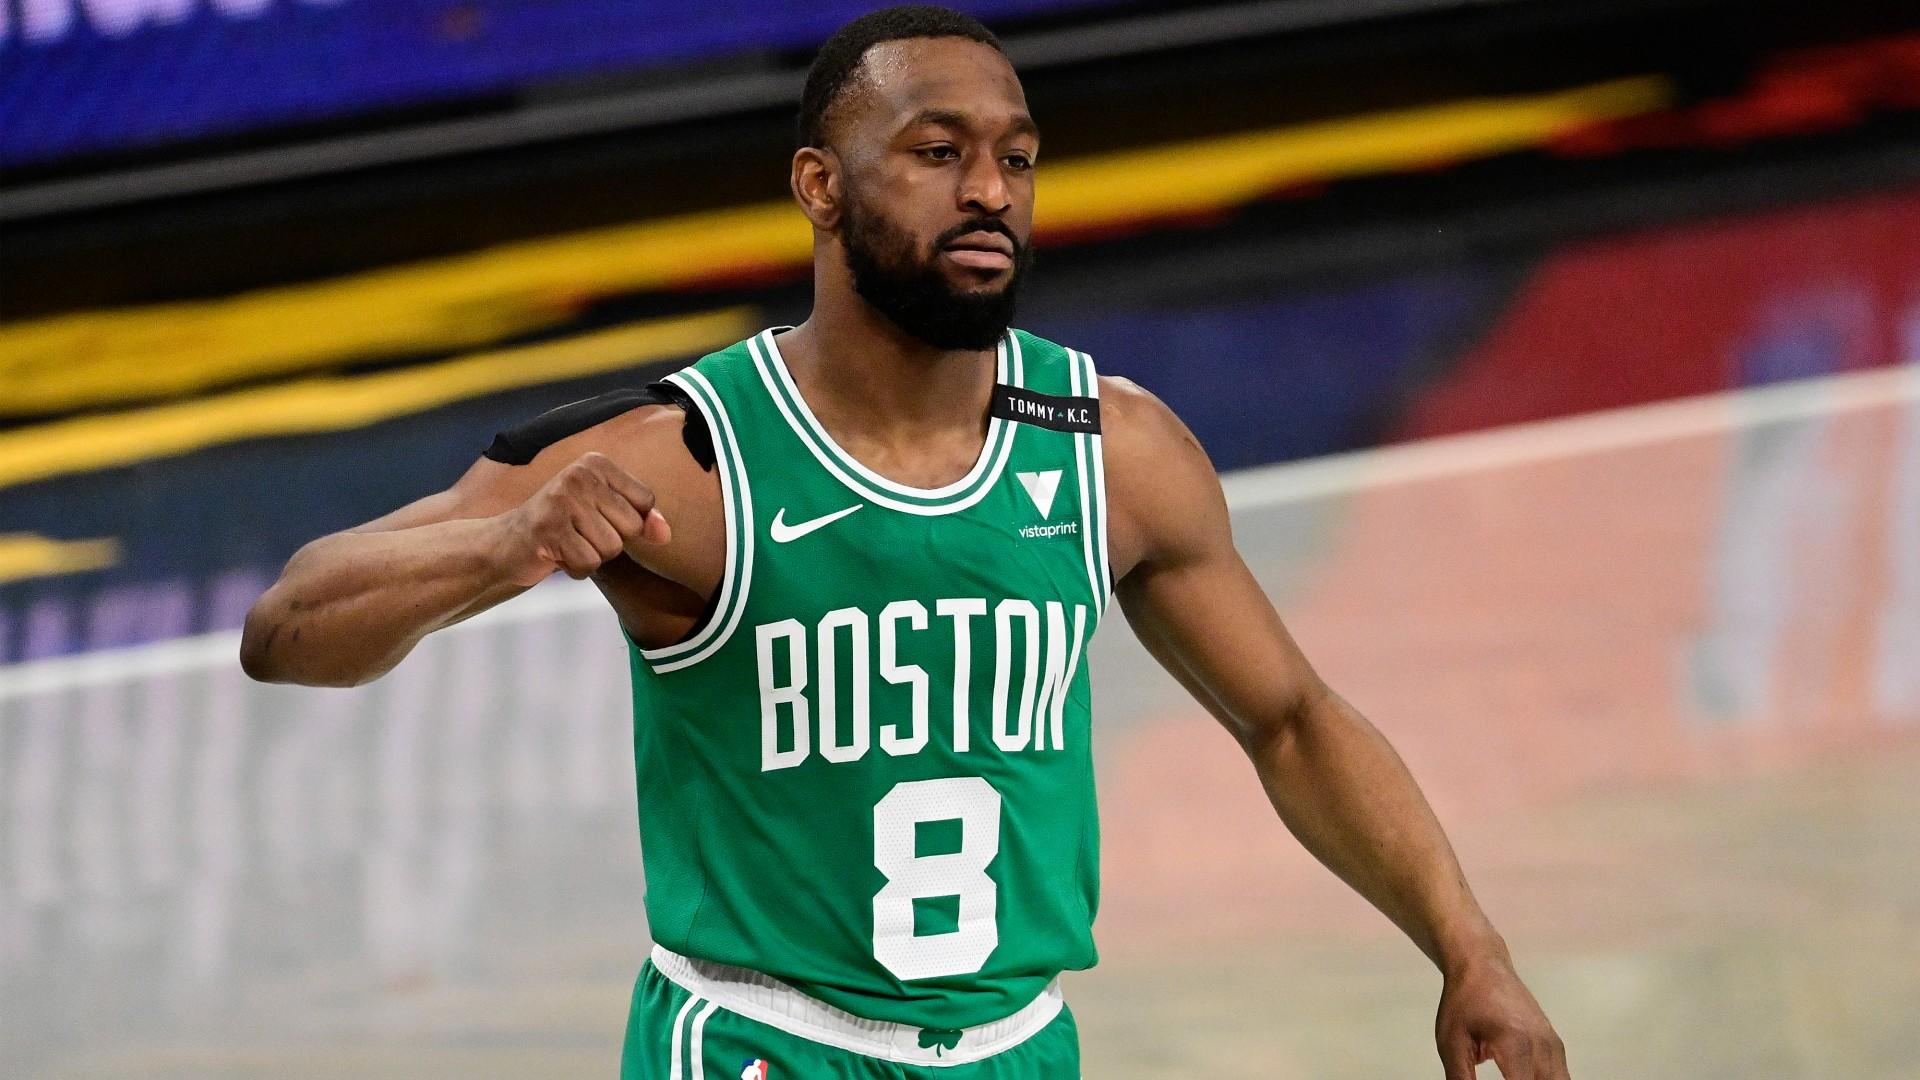 Kemba Walker trade rumors: Celtics star point guard in 'mutual agreement' they should split